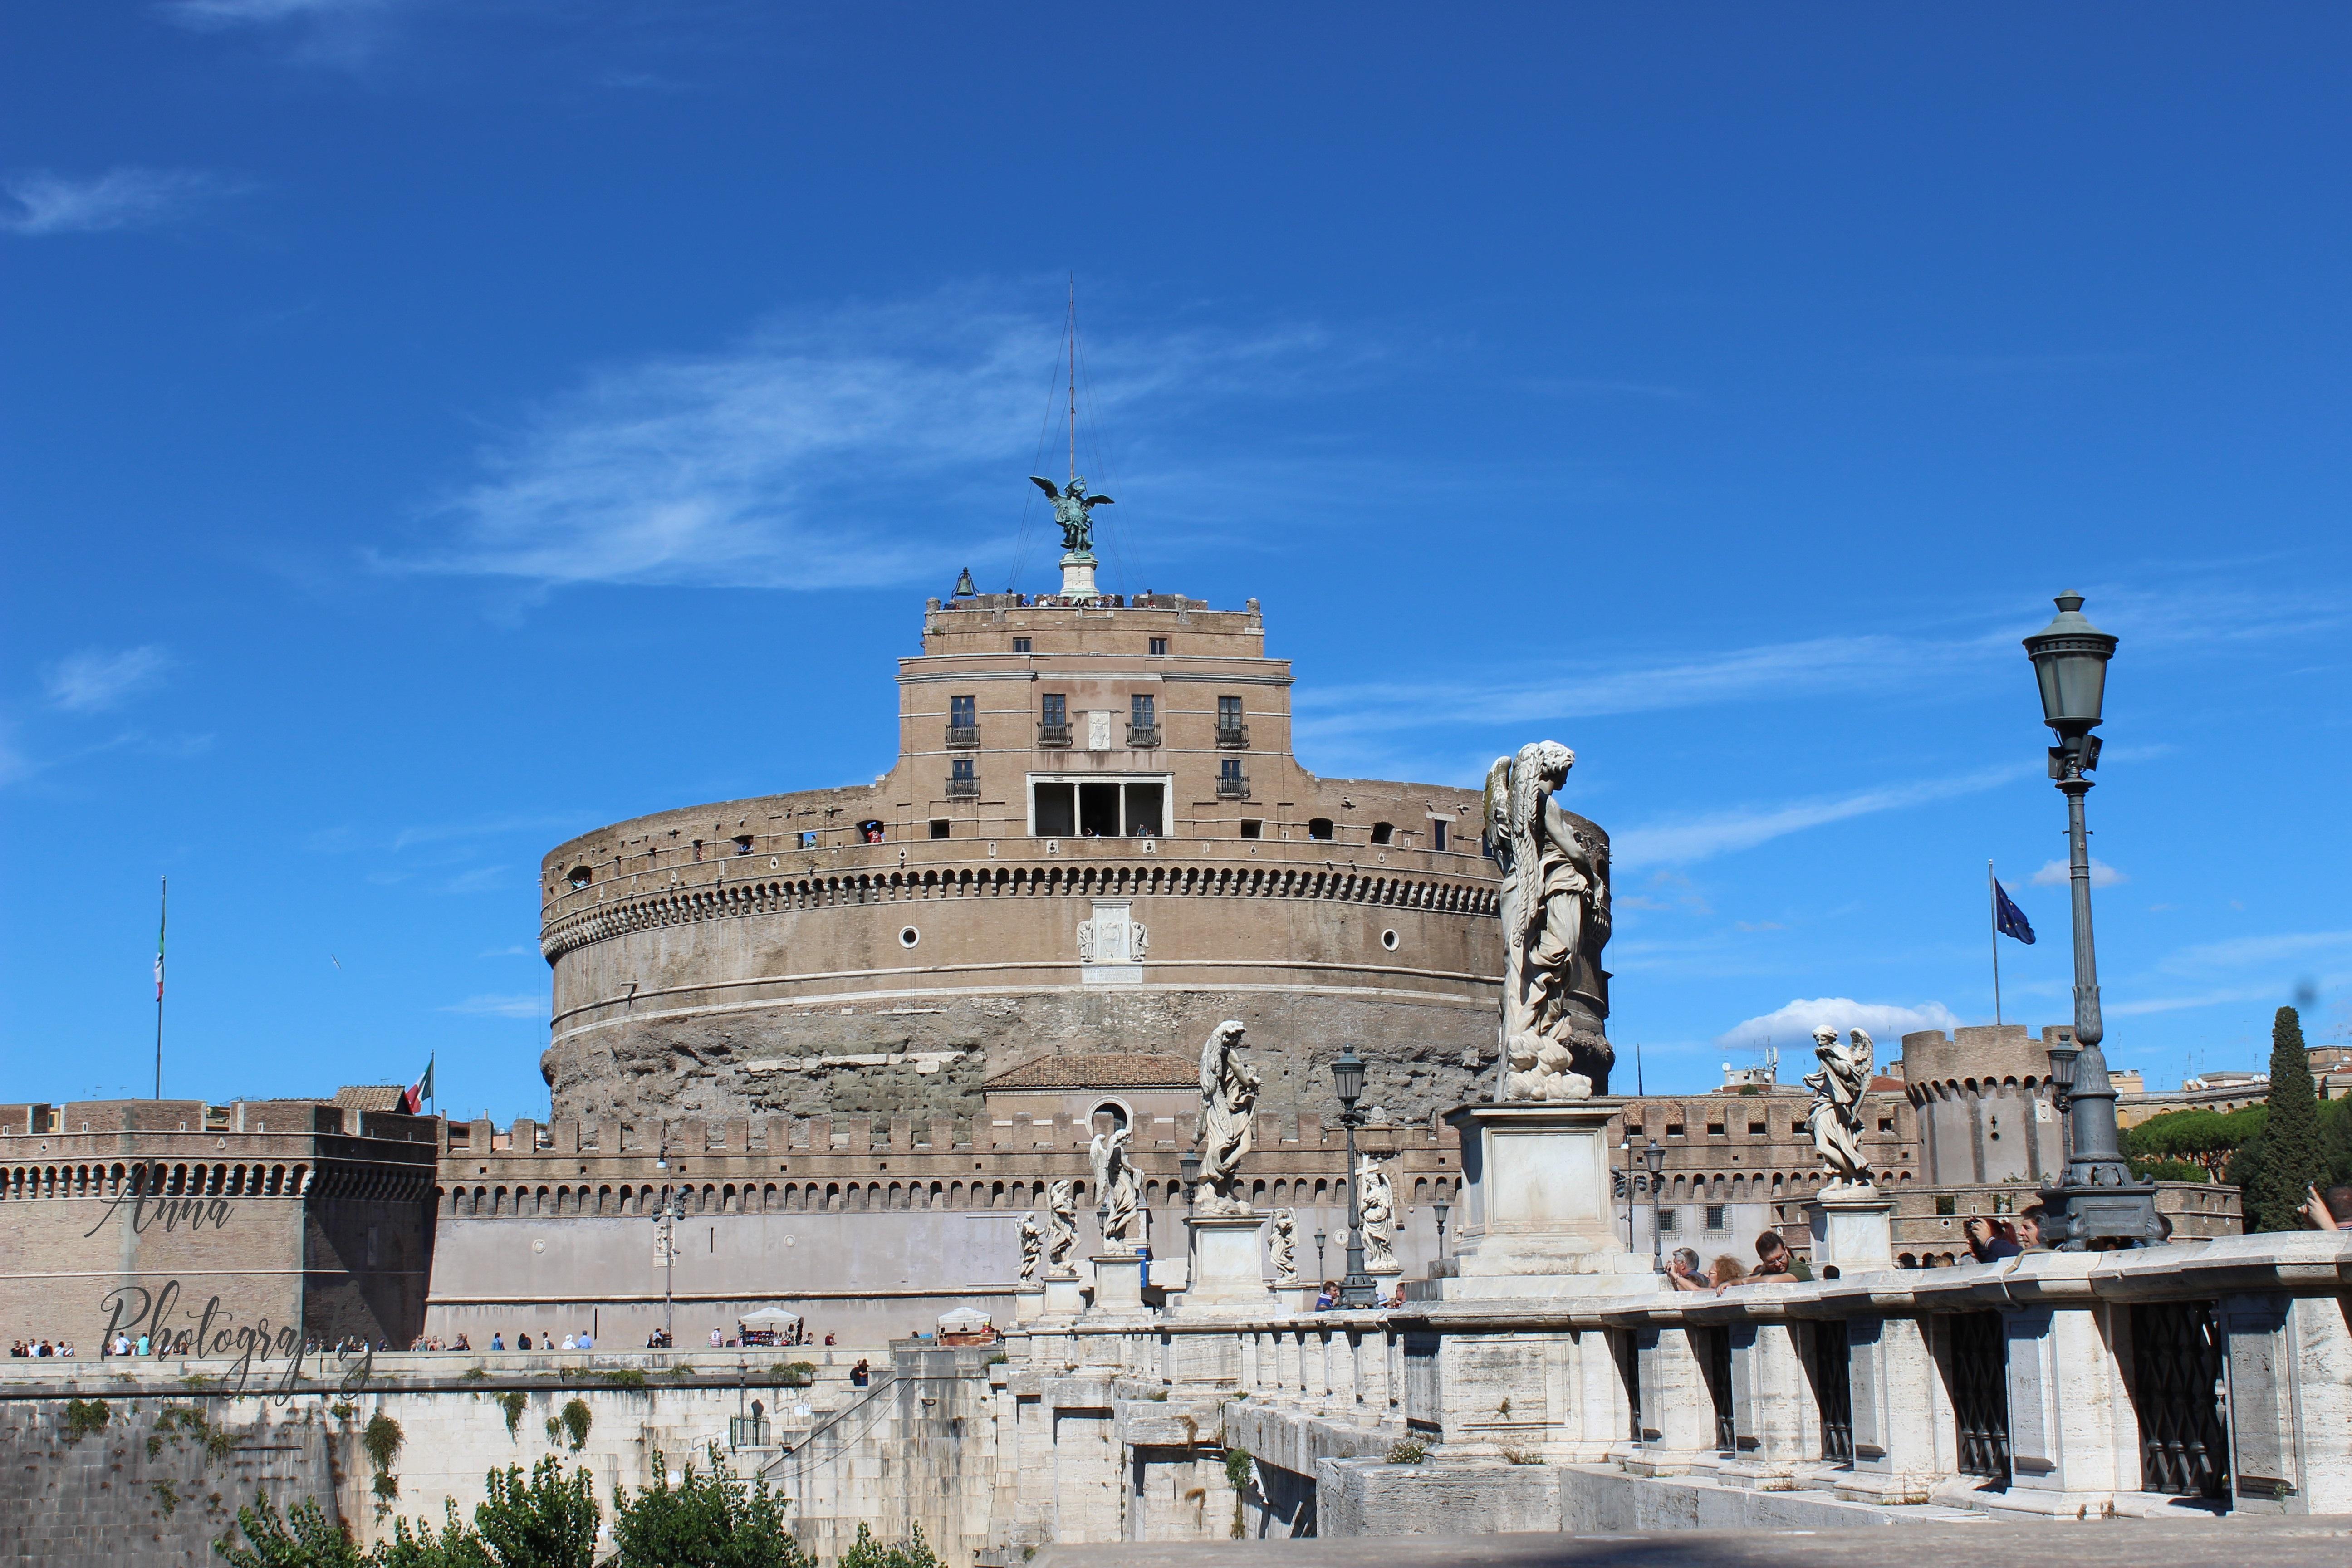 Castel Sant'Angelo Rome example image 1